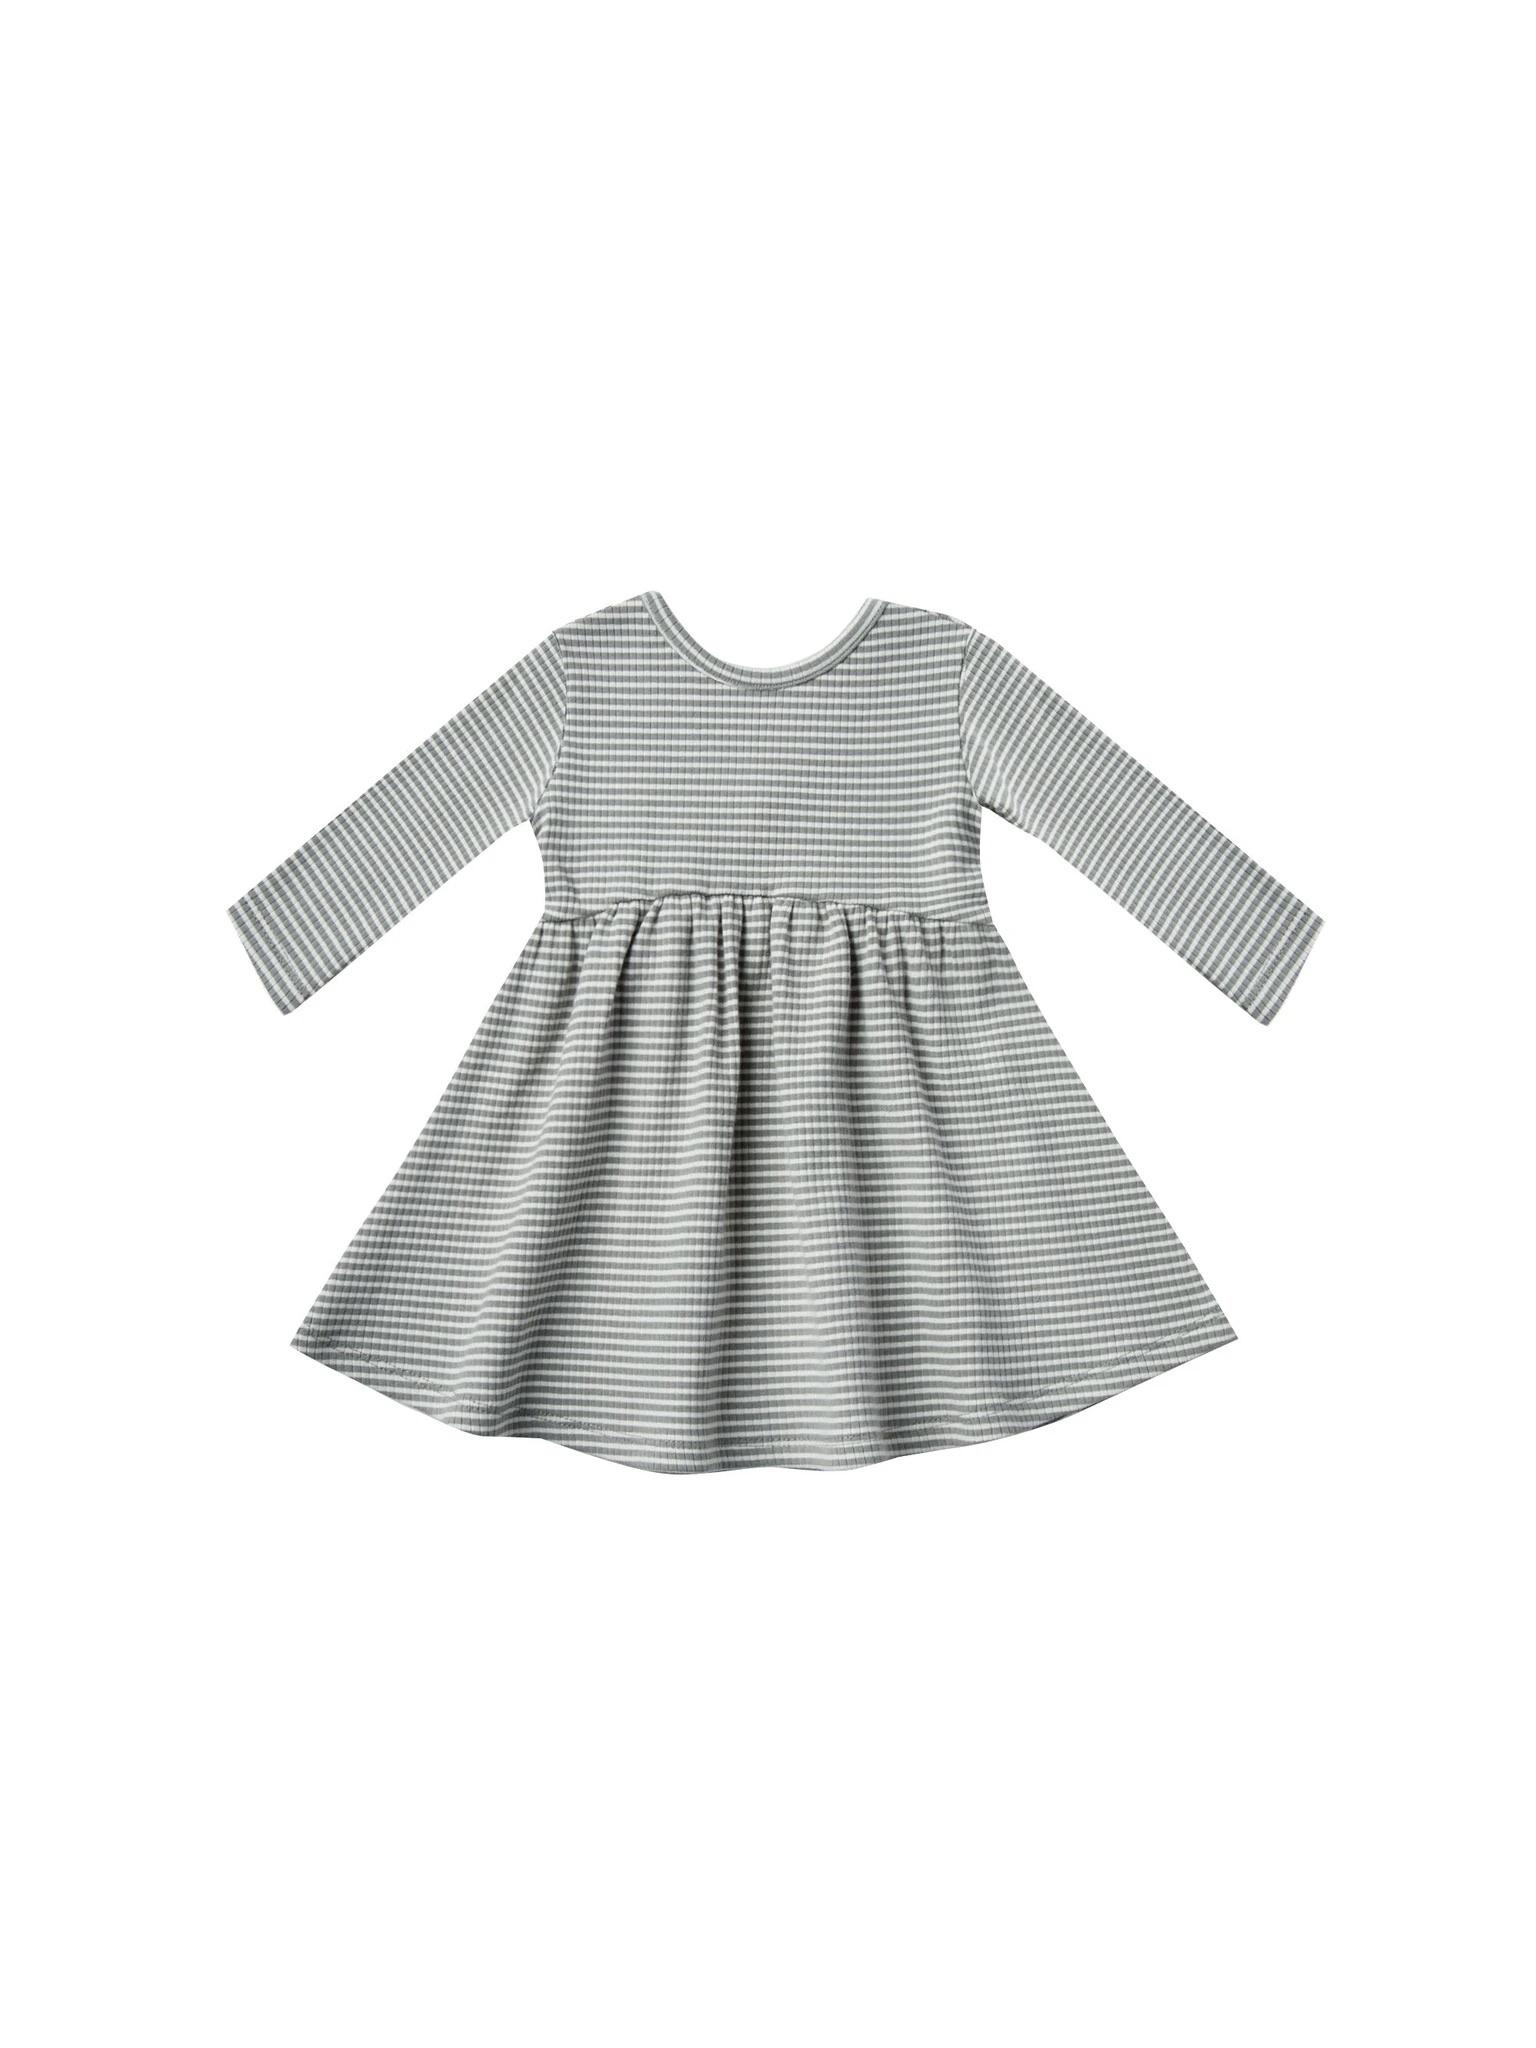 Quincy Mae - QM QM BA - Ribbed Longsleeve Dress in Eucalyptus Stripe